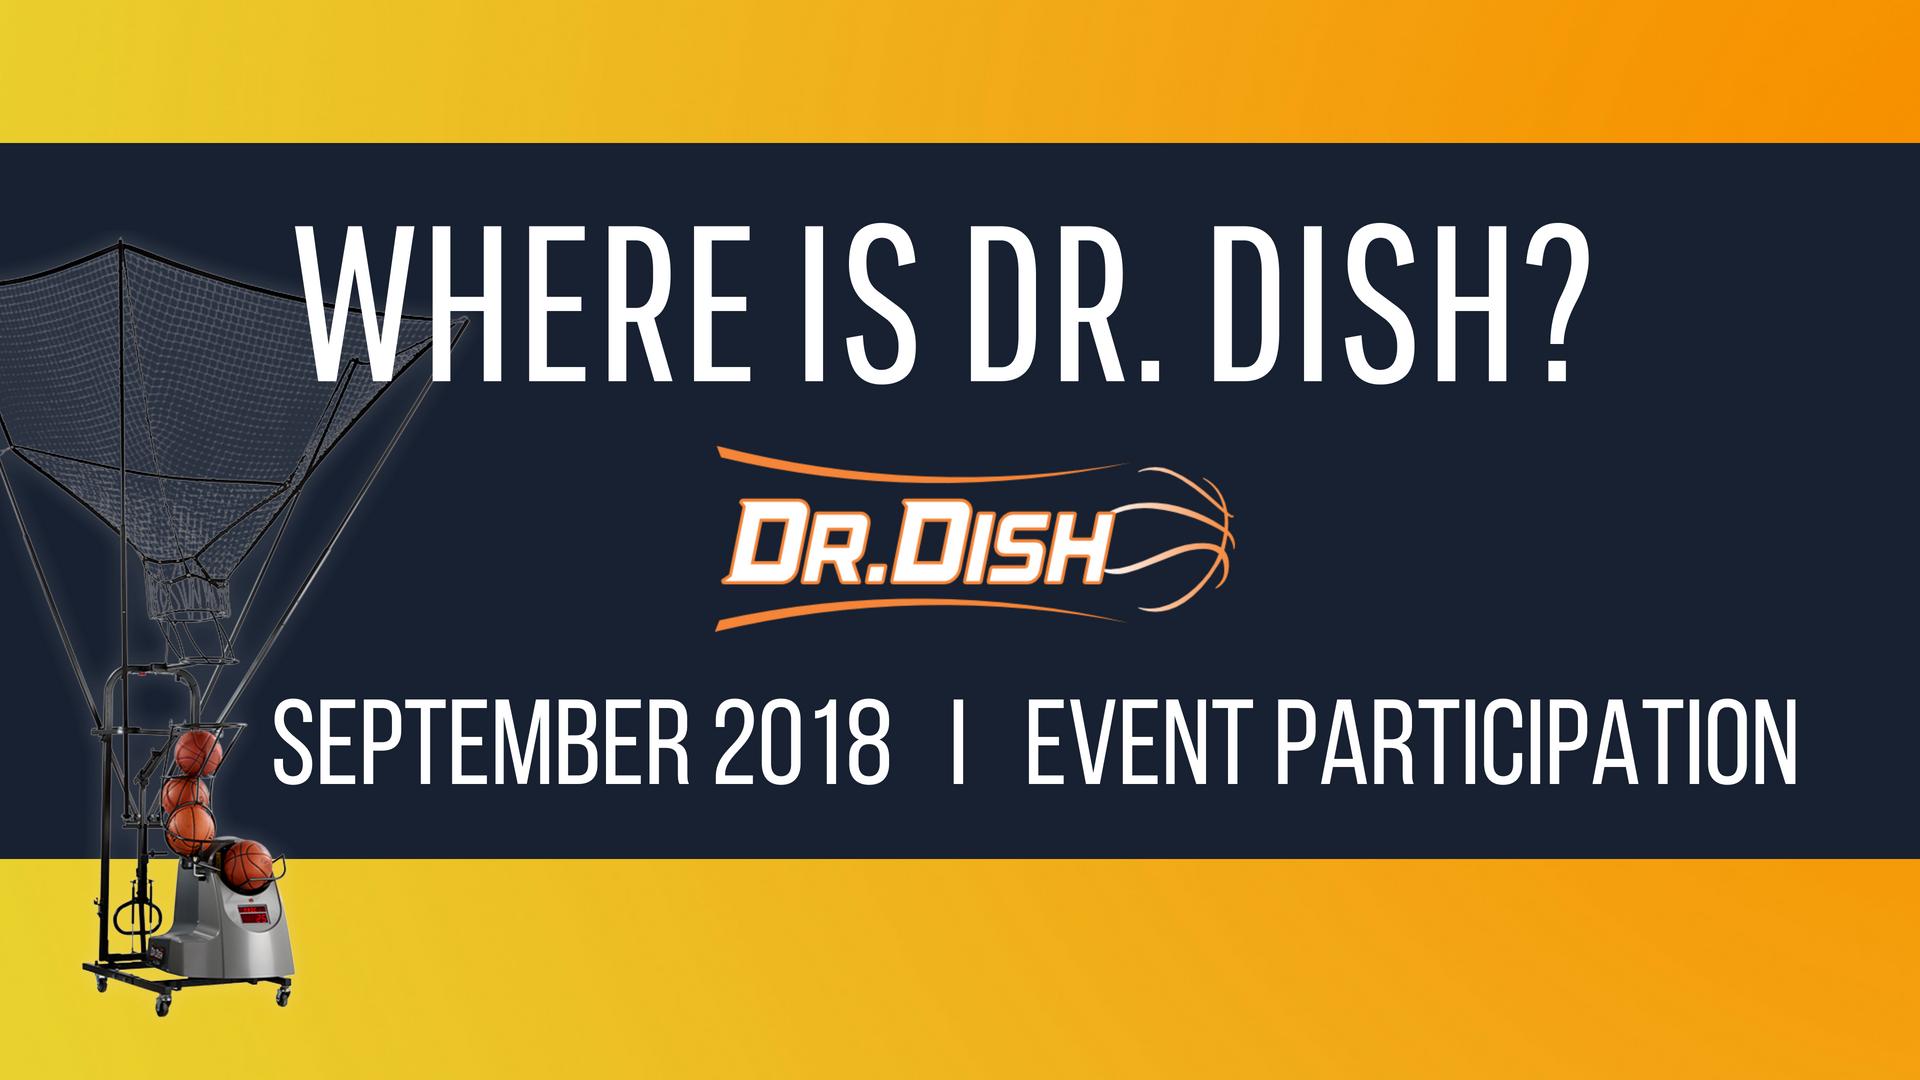 Where is Dr. Dish: September 2018